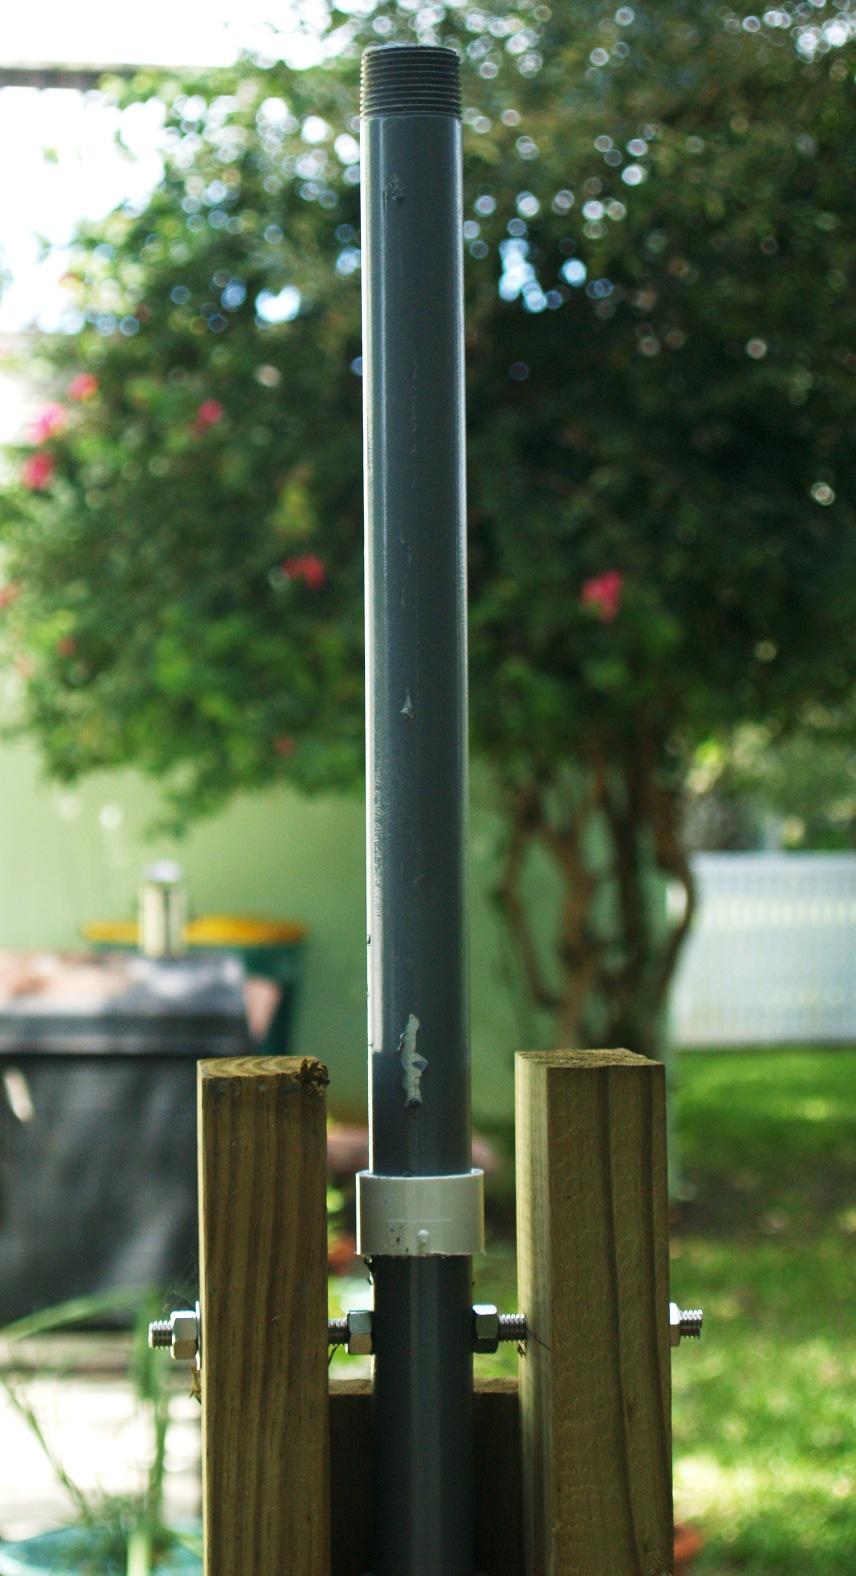 Wt5l Vertical Antenna Tilt Mount